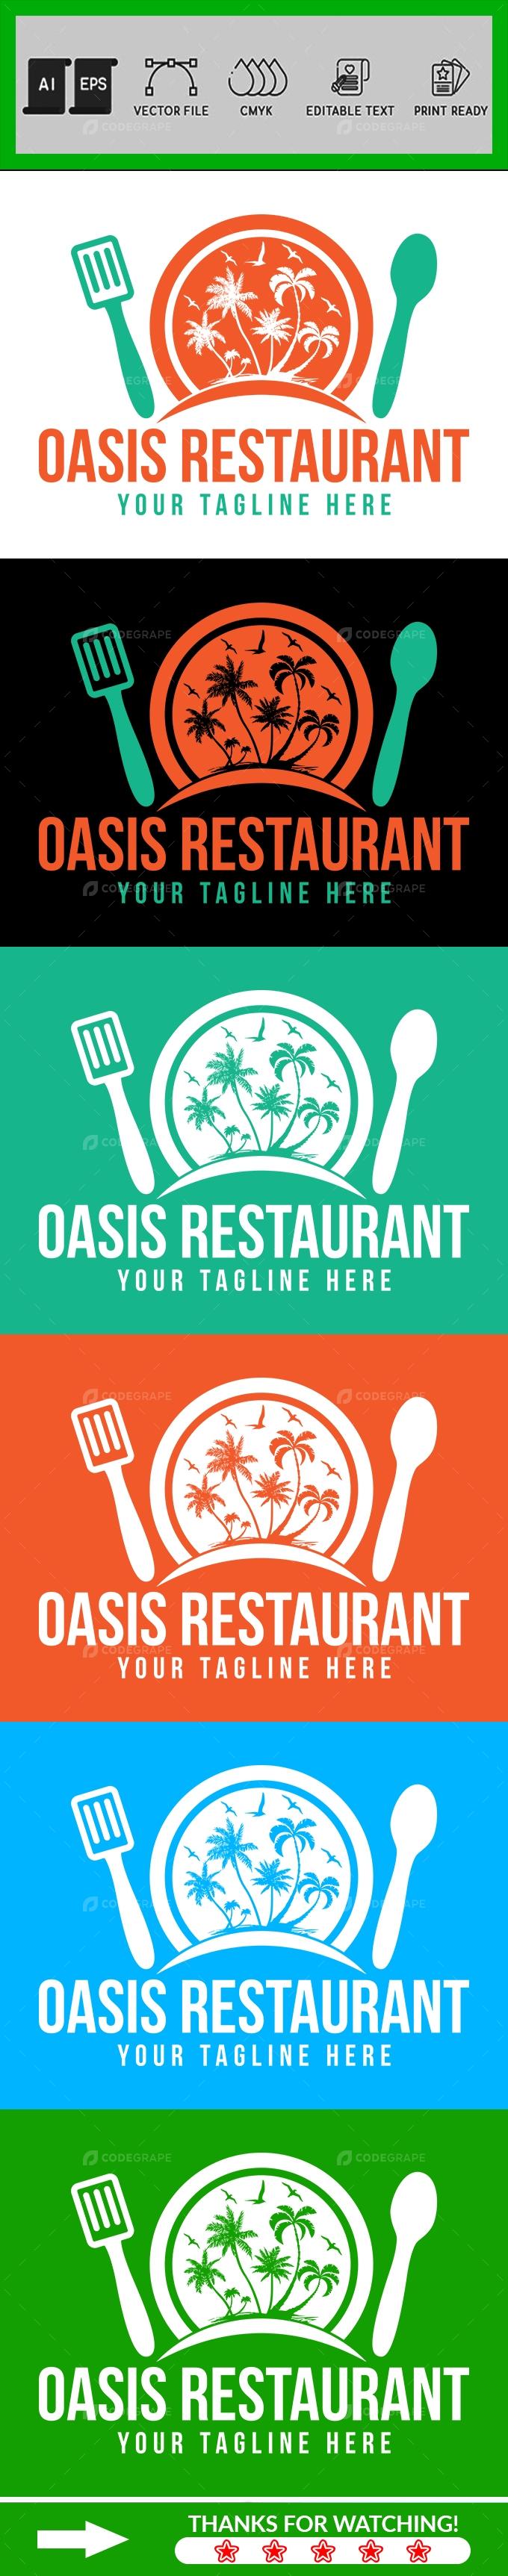 Oasis Restaurant Logo Design Template